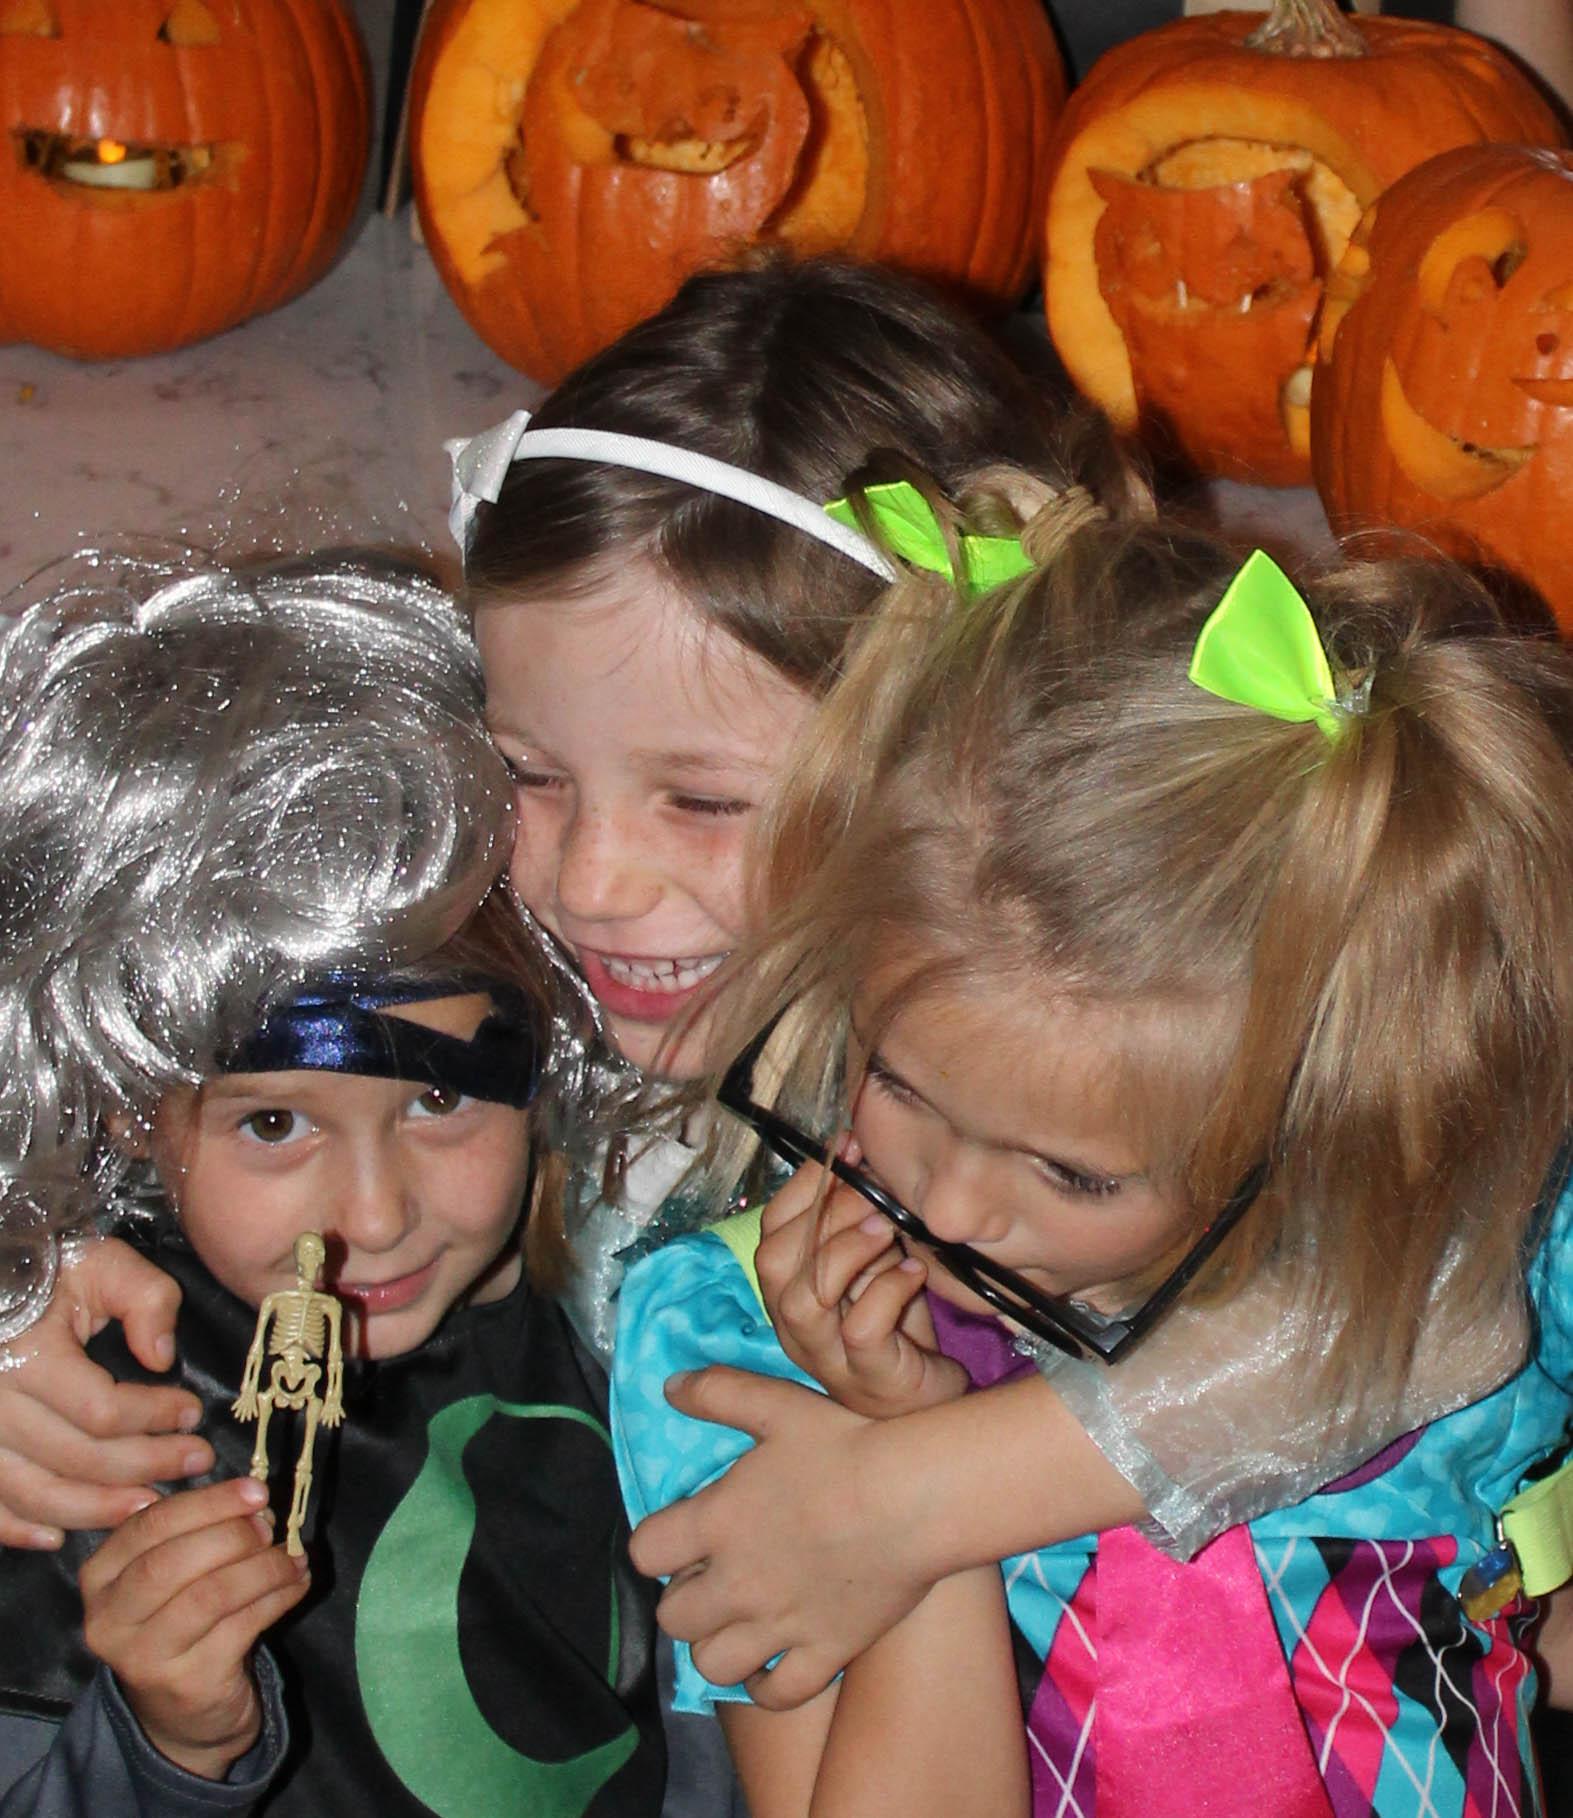 pumpkin-carving-party-costumes-kids-halloween-59